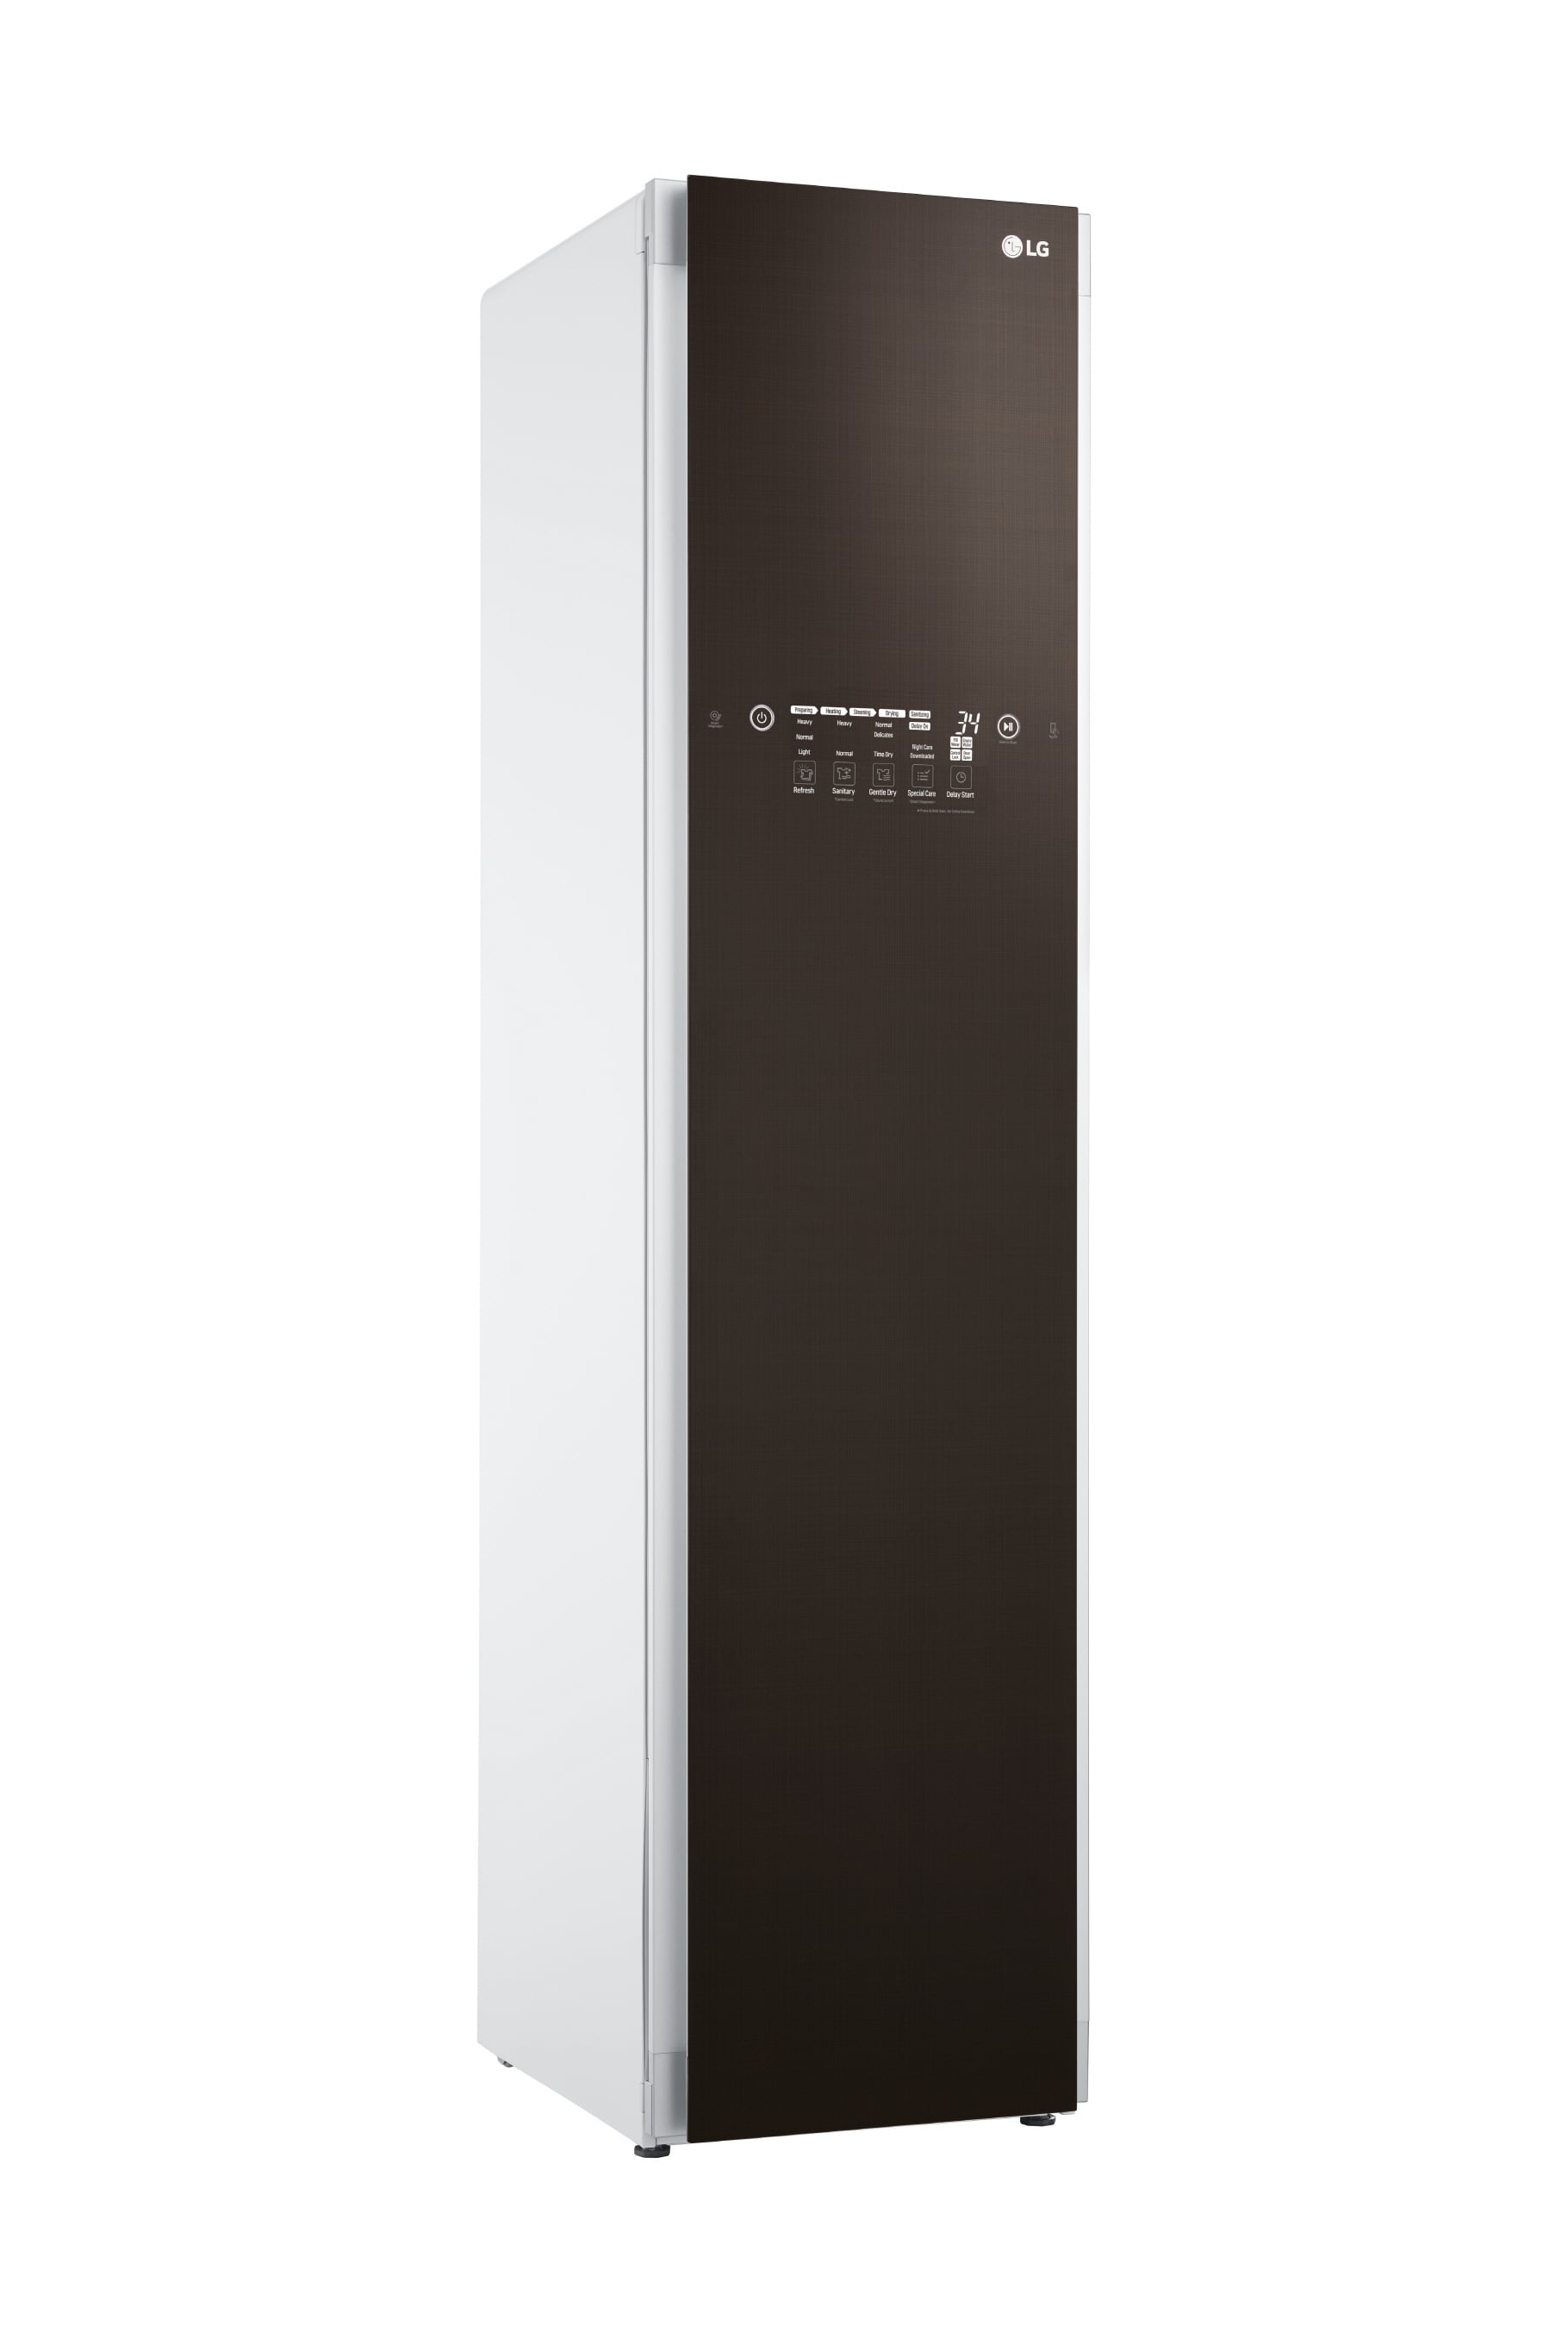 LG Styler Clothing Care System